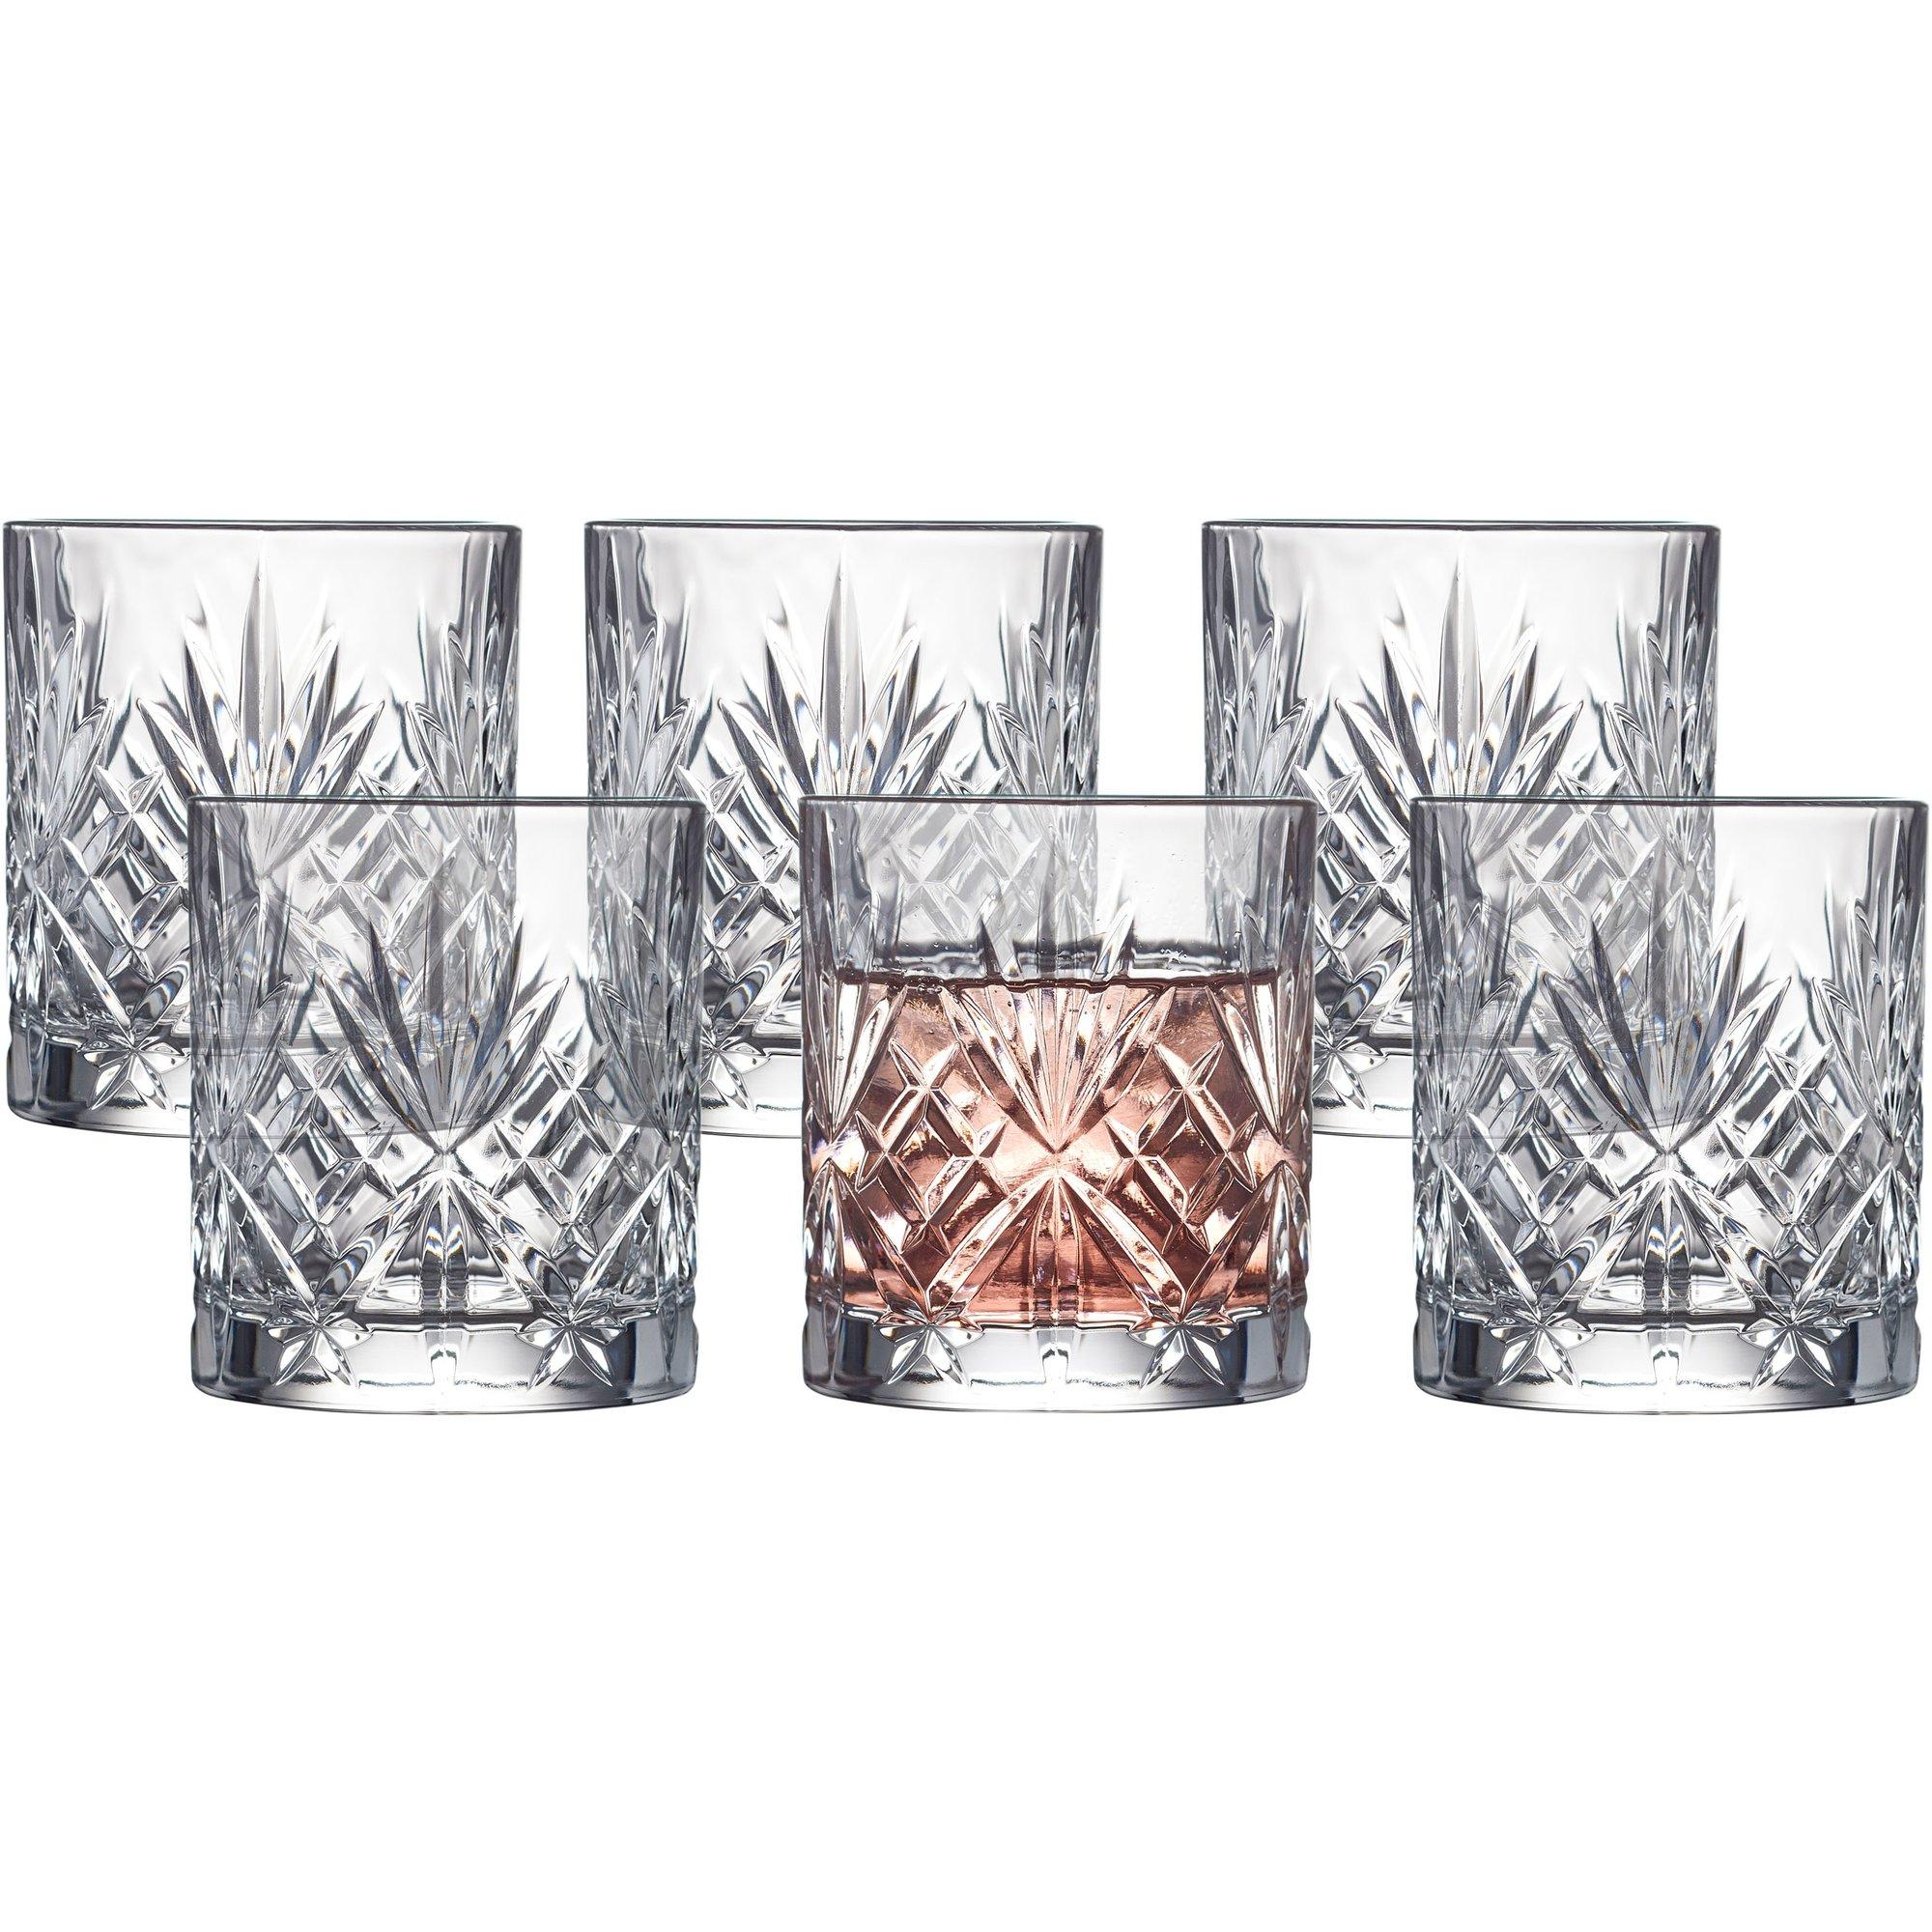 Lyngby Glas Melodia vattenglas 6 st.